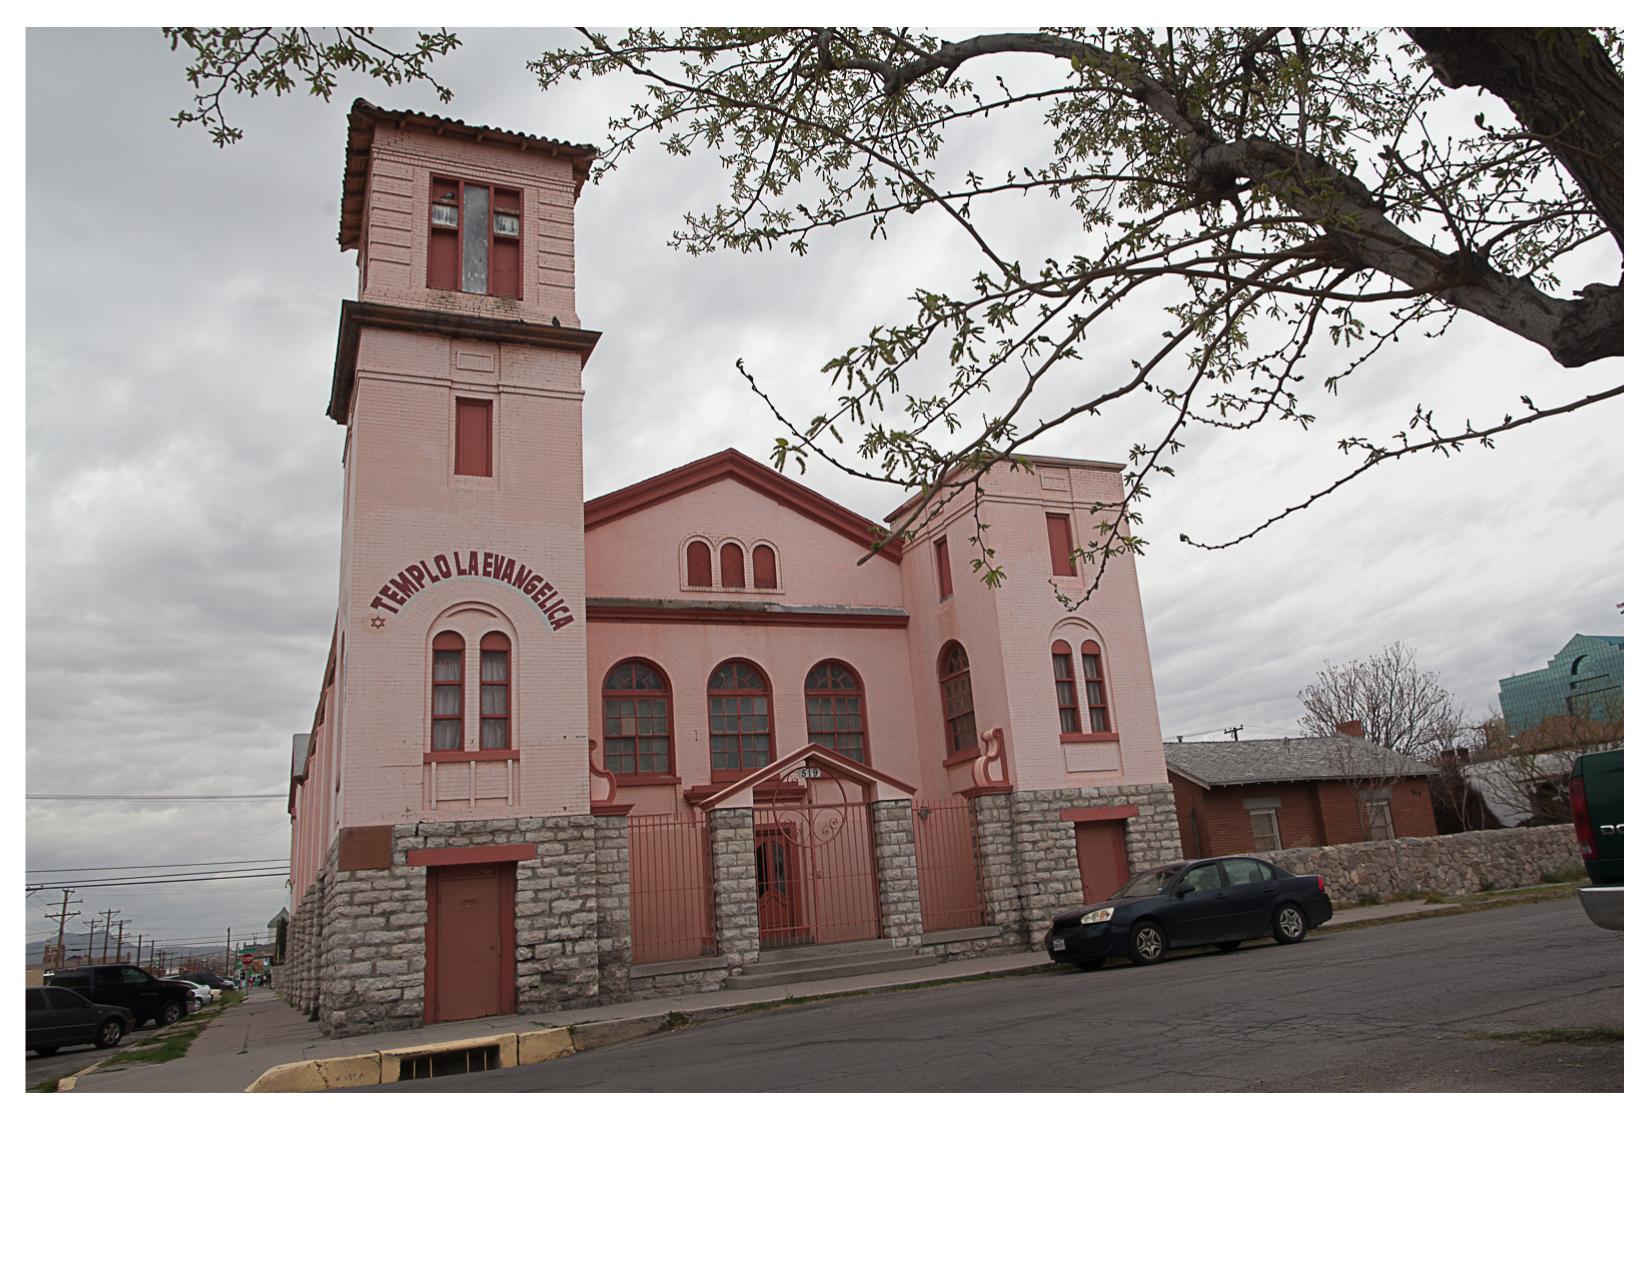 Evangelical Church, El Paso, TX